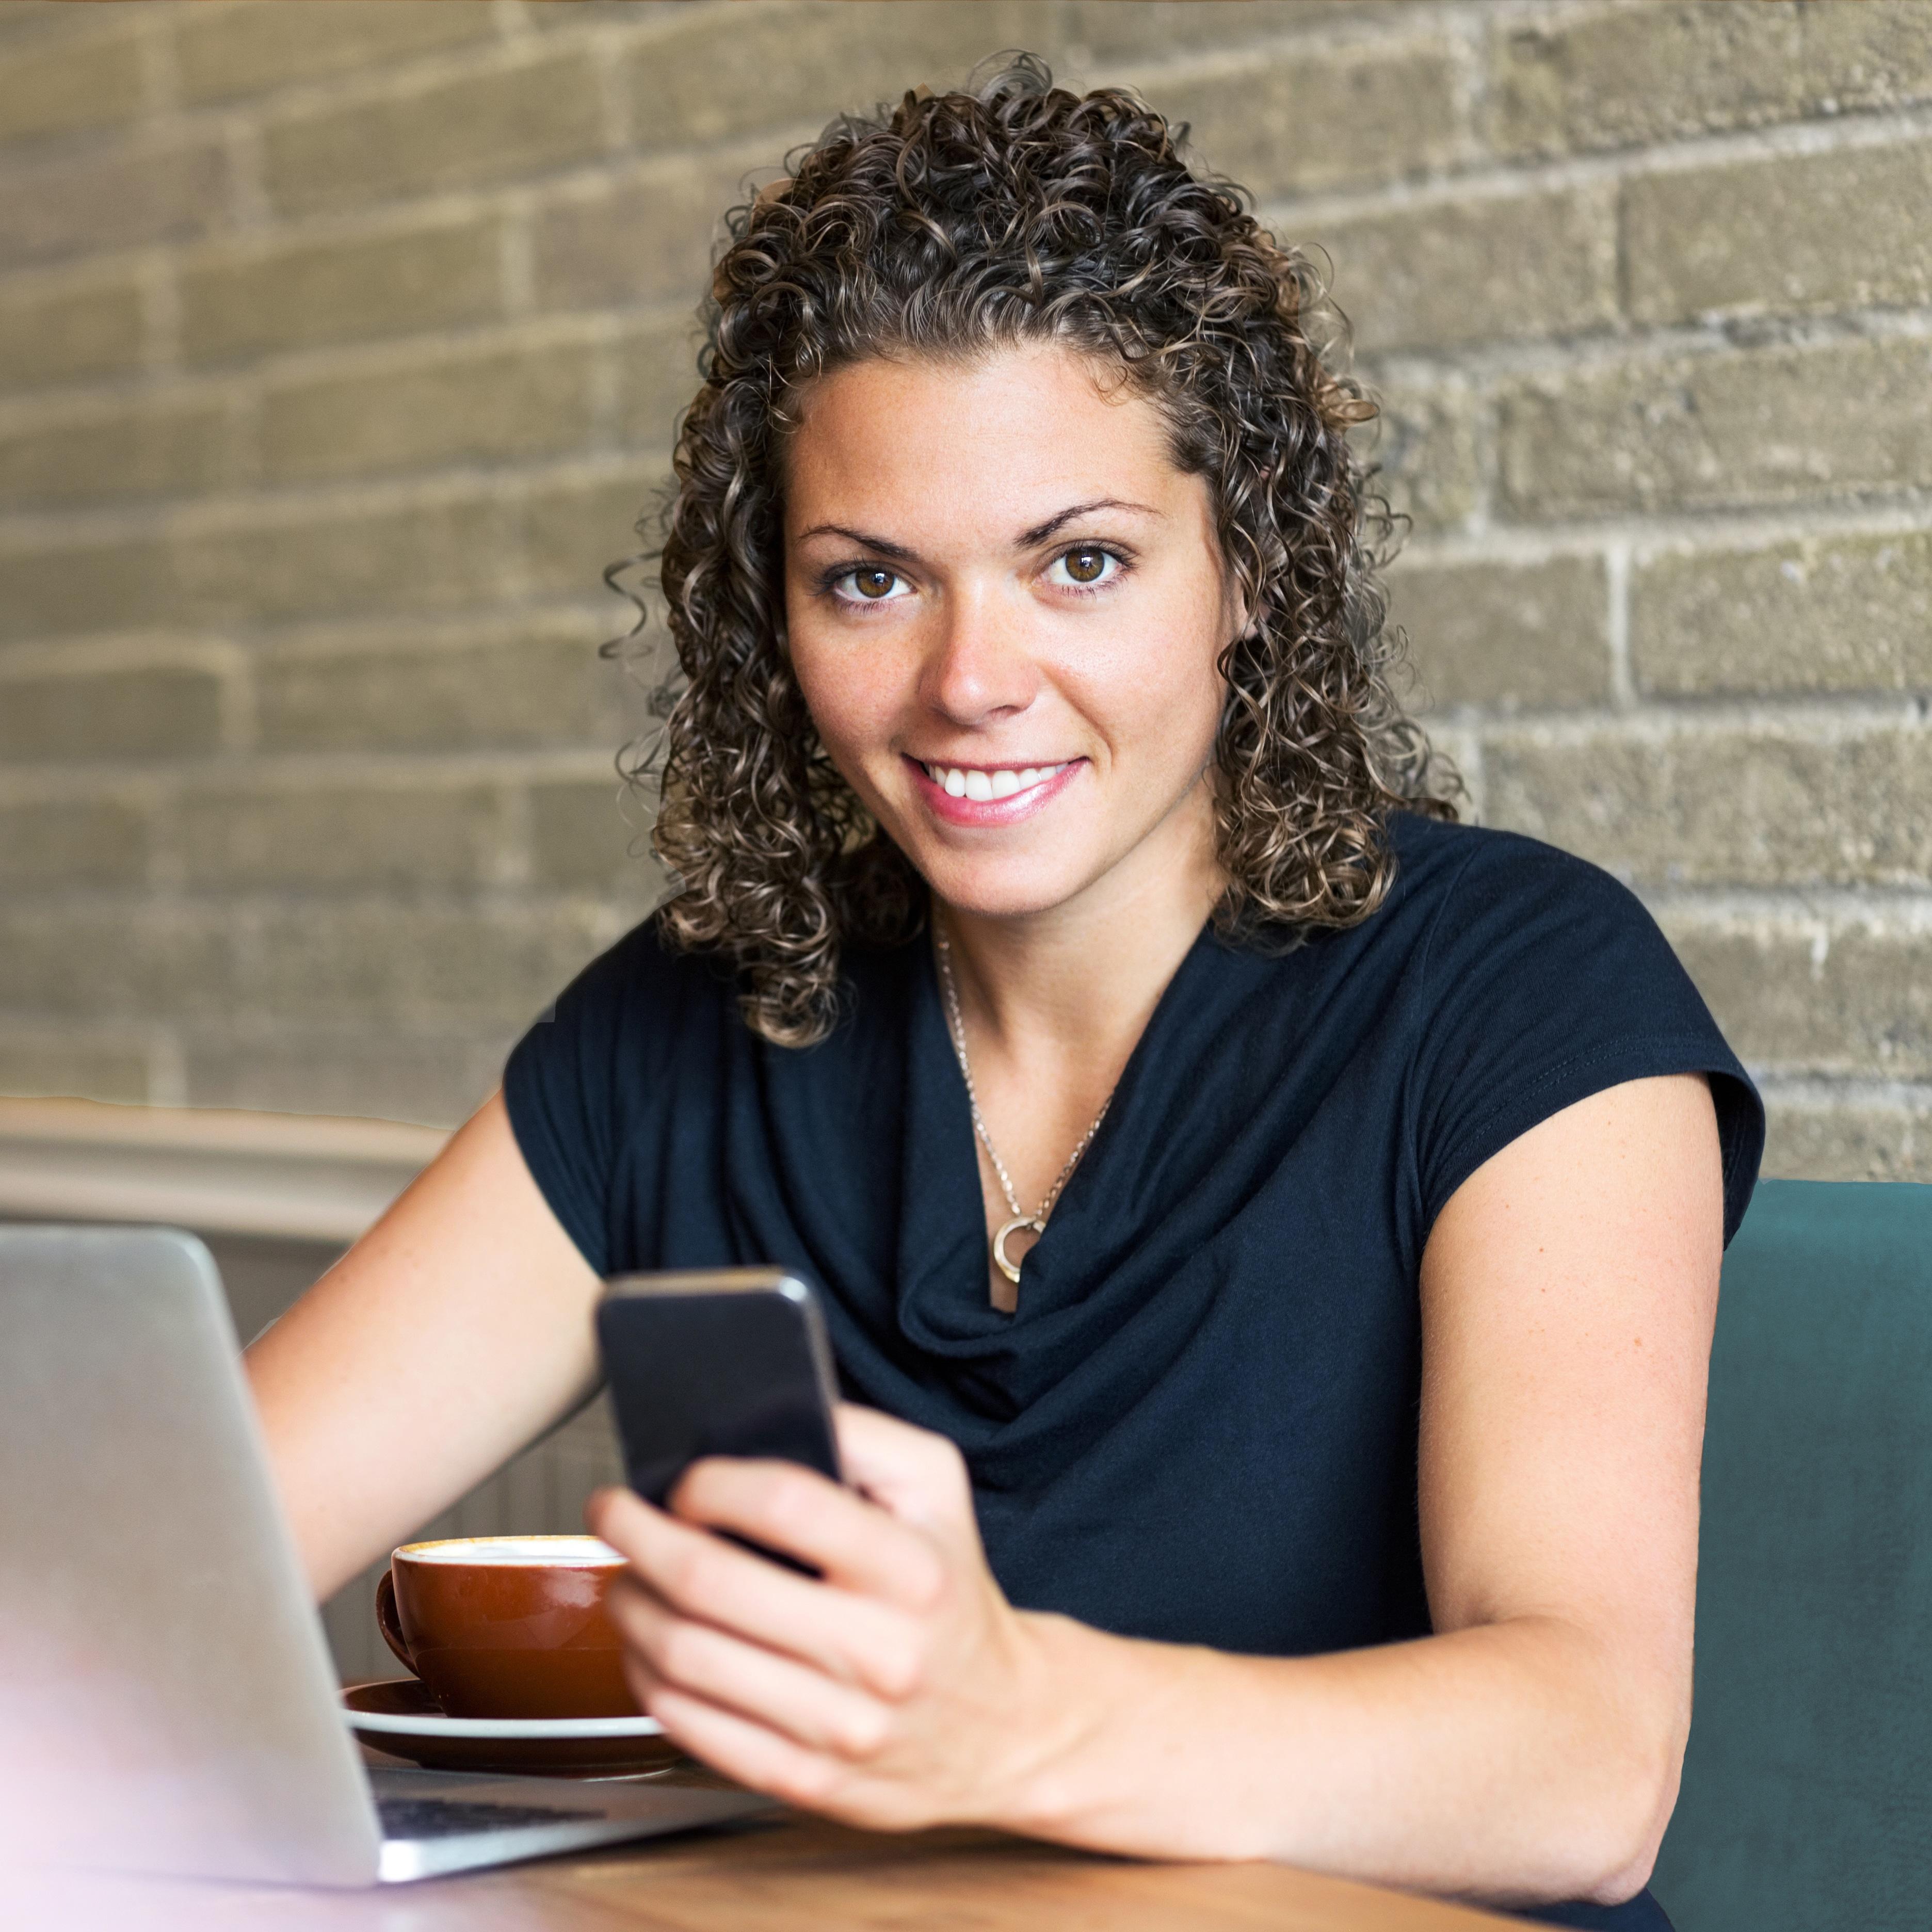 Ung kvinna sitter vid laptop med smatphone i handen.